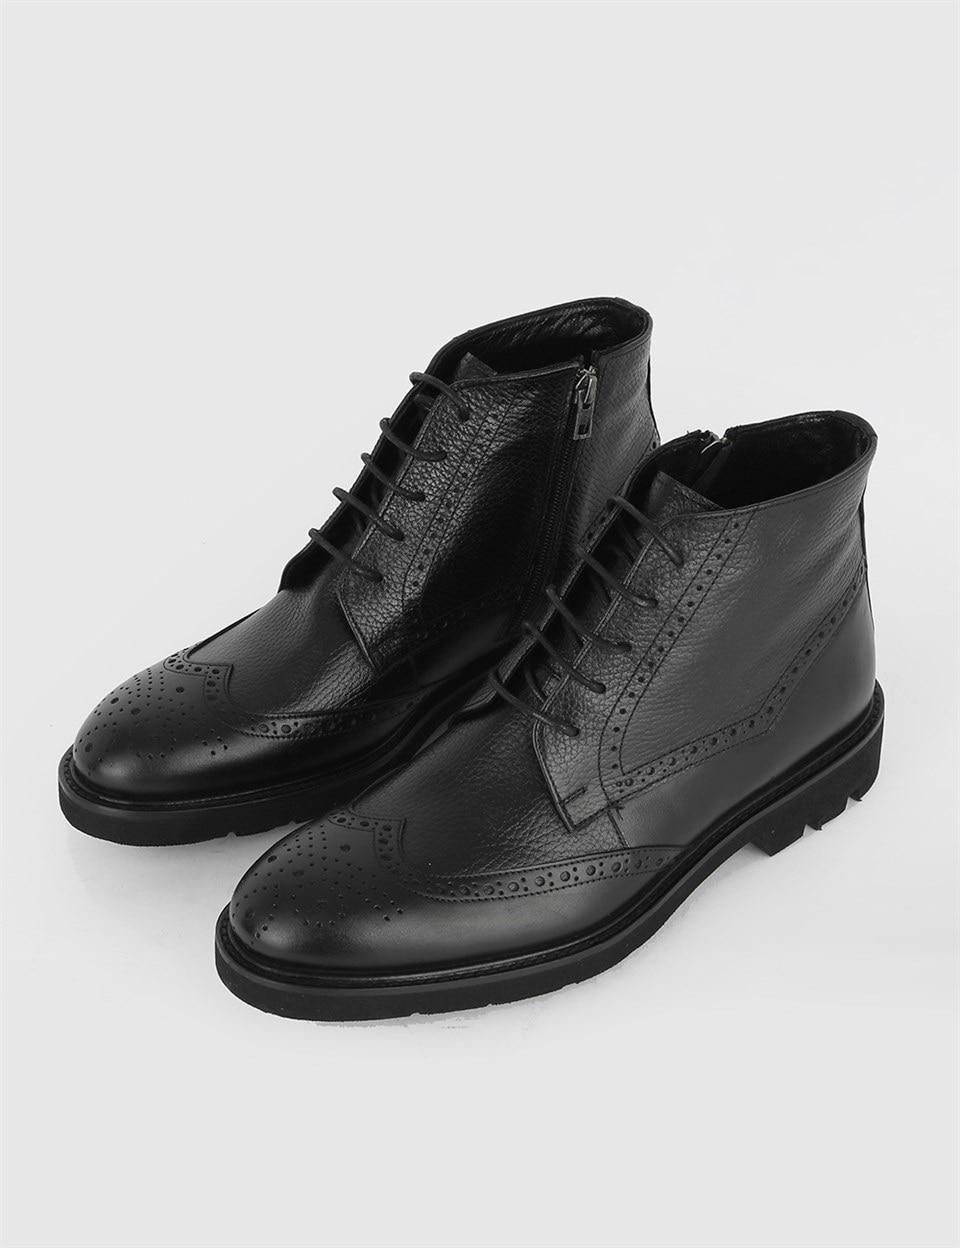 ILVi-جلد طبيعي صناعة يدوية Dyna حذاء جلد أسود للرجال BootMen خريف وشتاء 2020